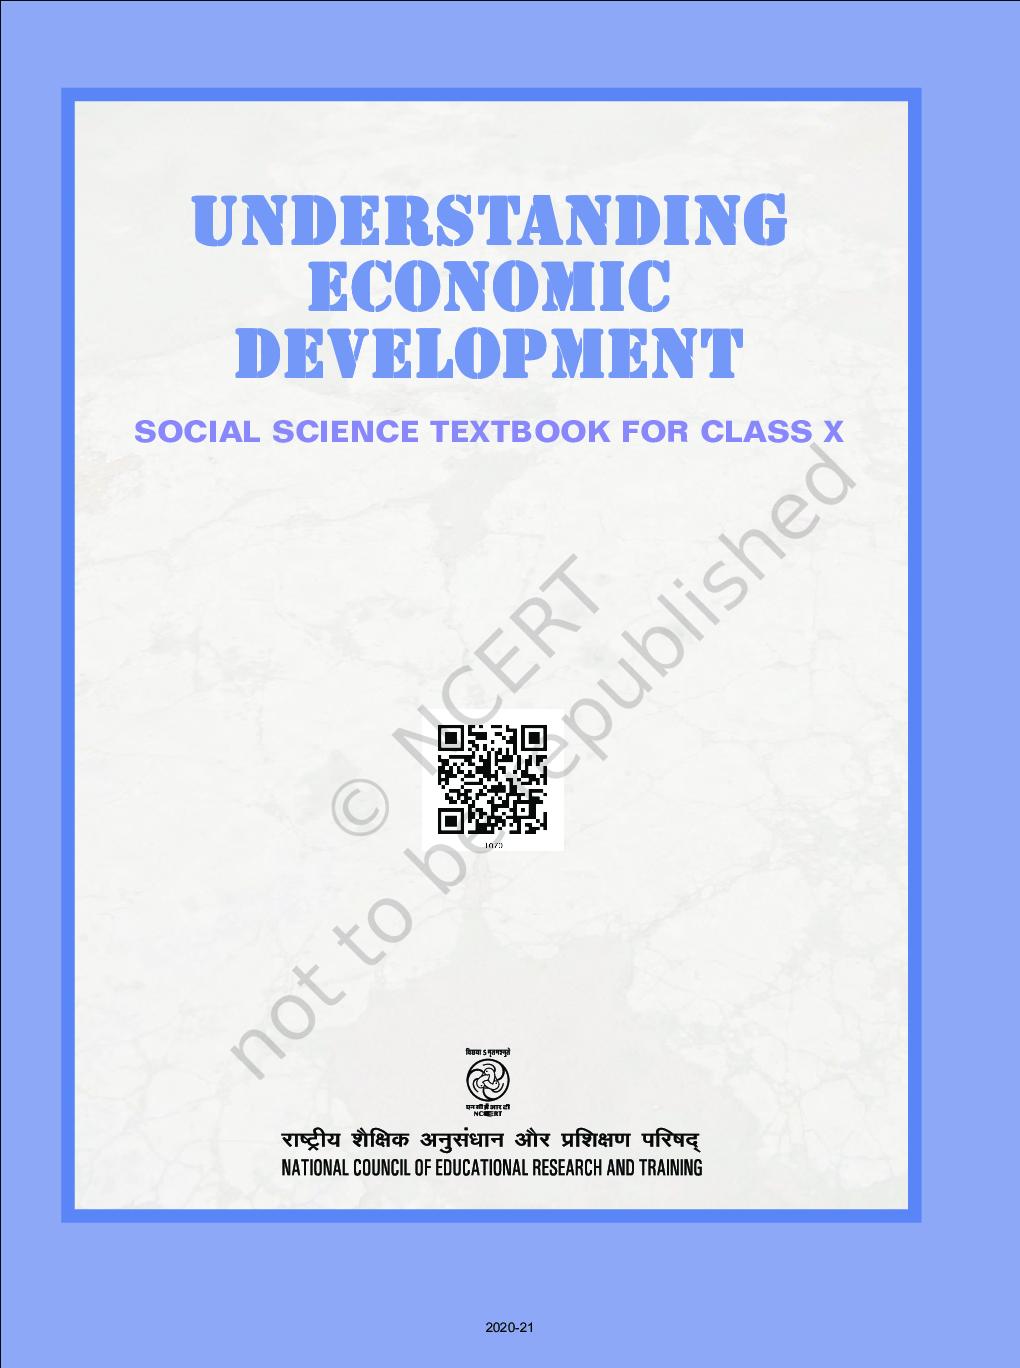 NCERT Understanding Economic Development Social Science Textbook For Class X - Page 2